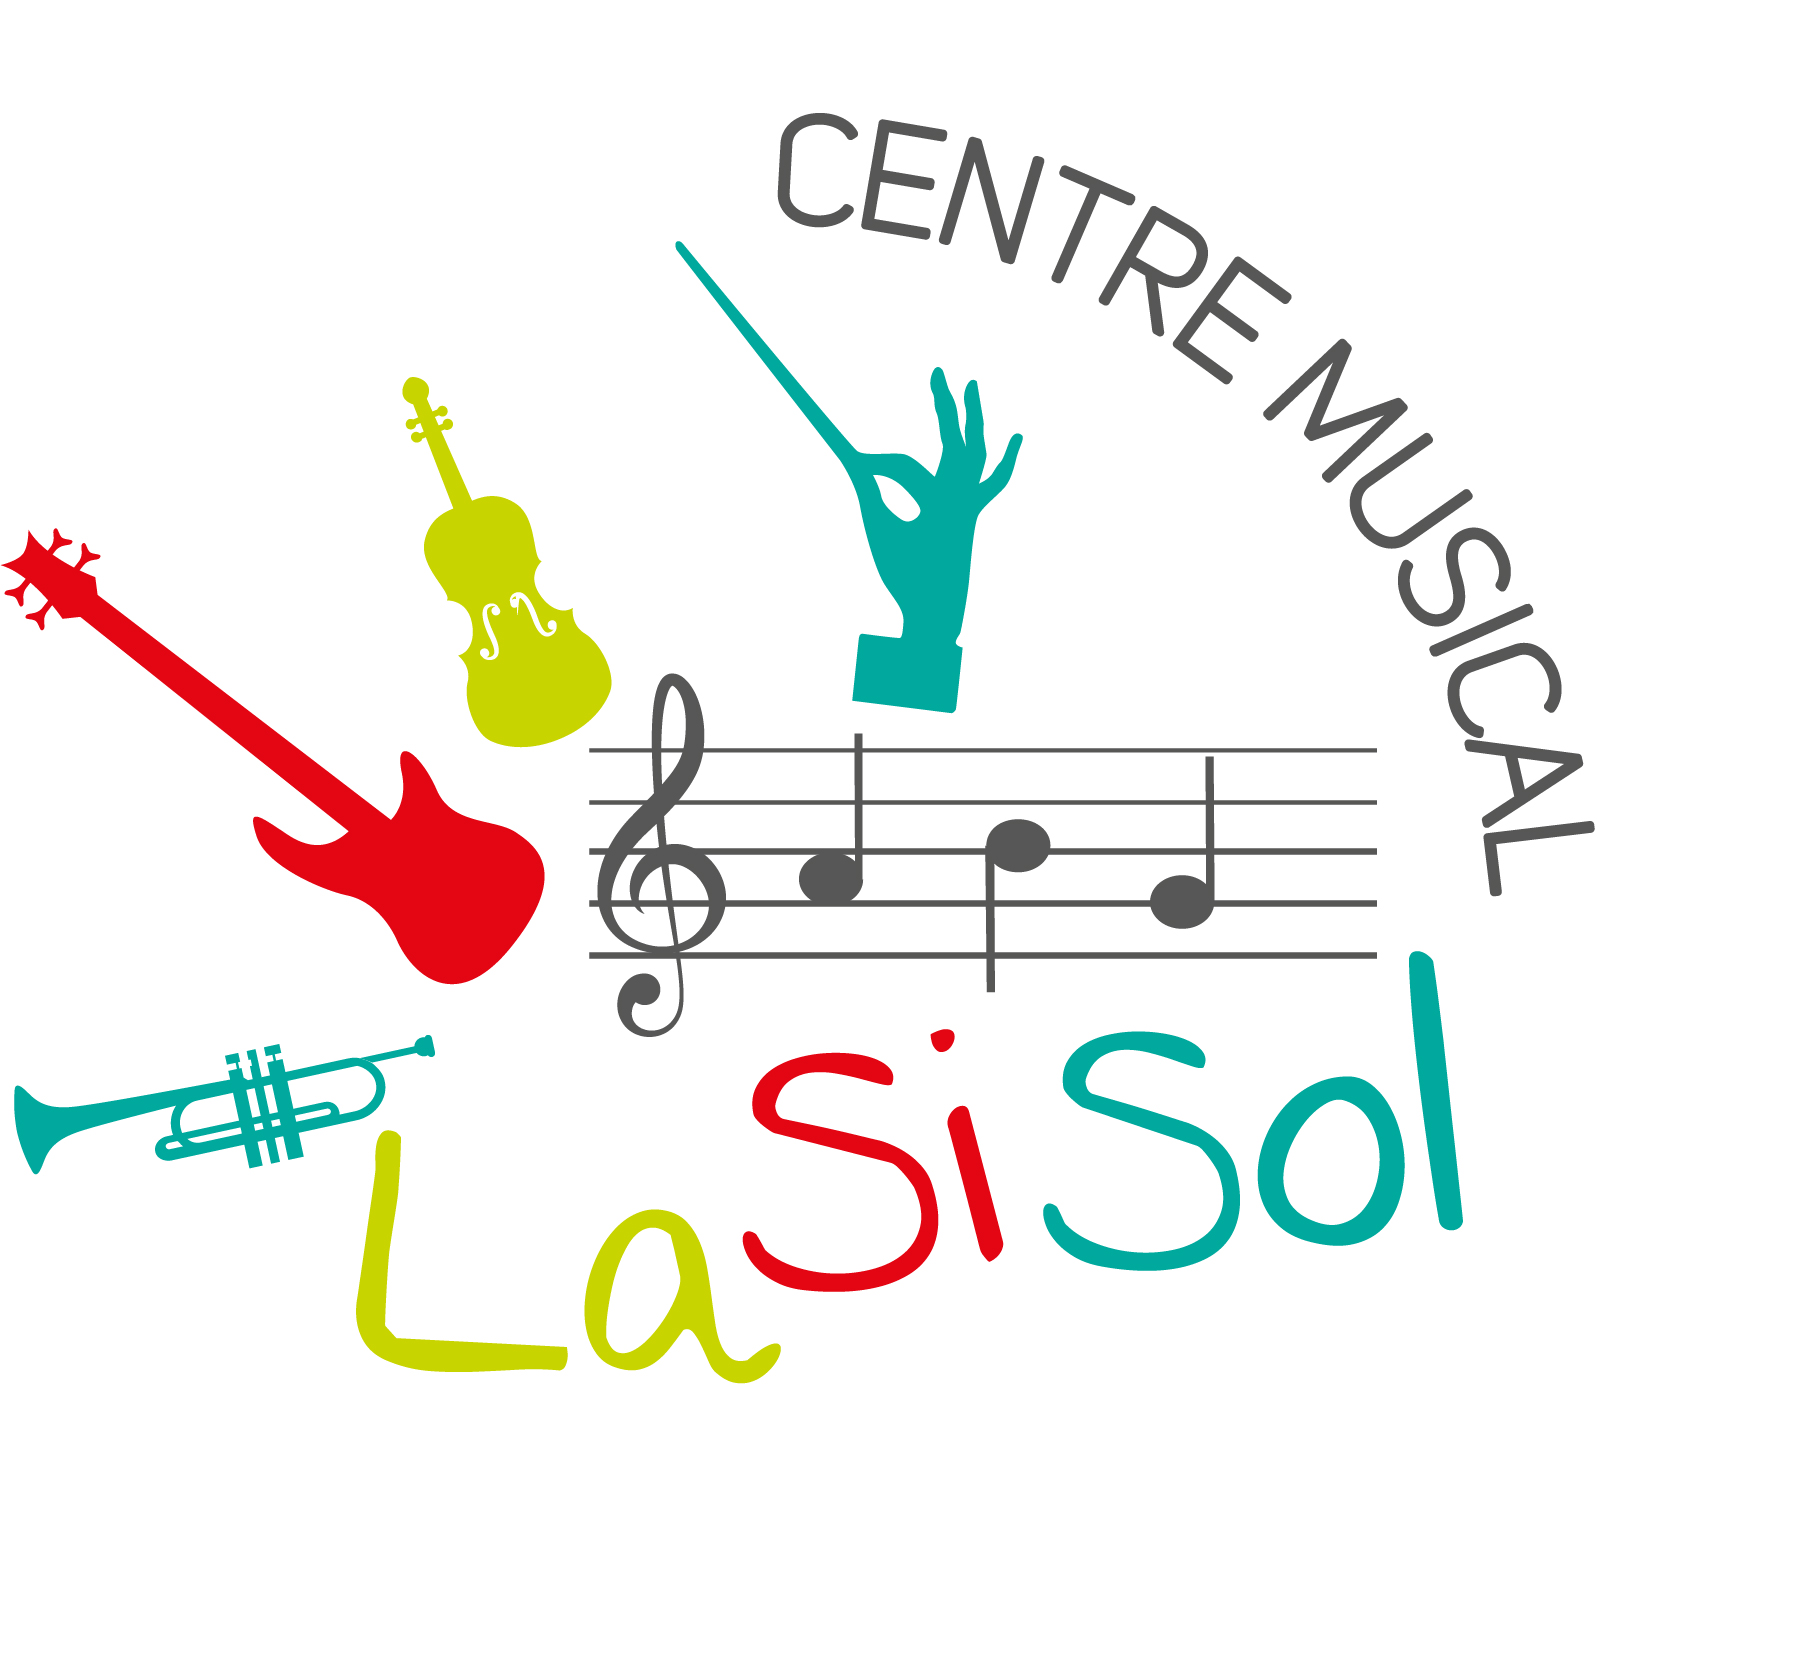 Centre Musical La Si Sol Moreuil